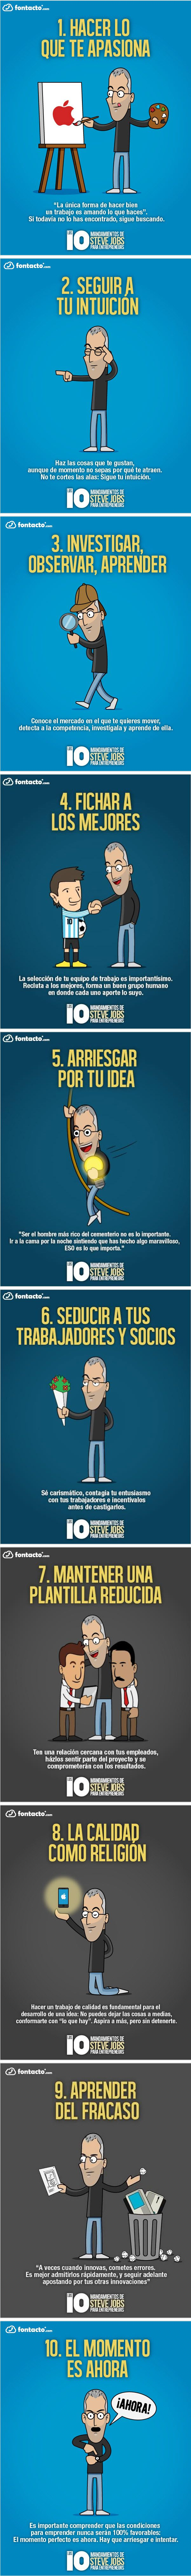 Los 10 mandamientos de Steve Jobs para emprendedores #infografia